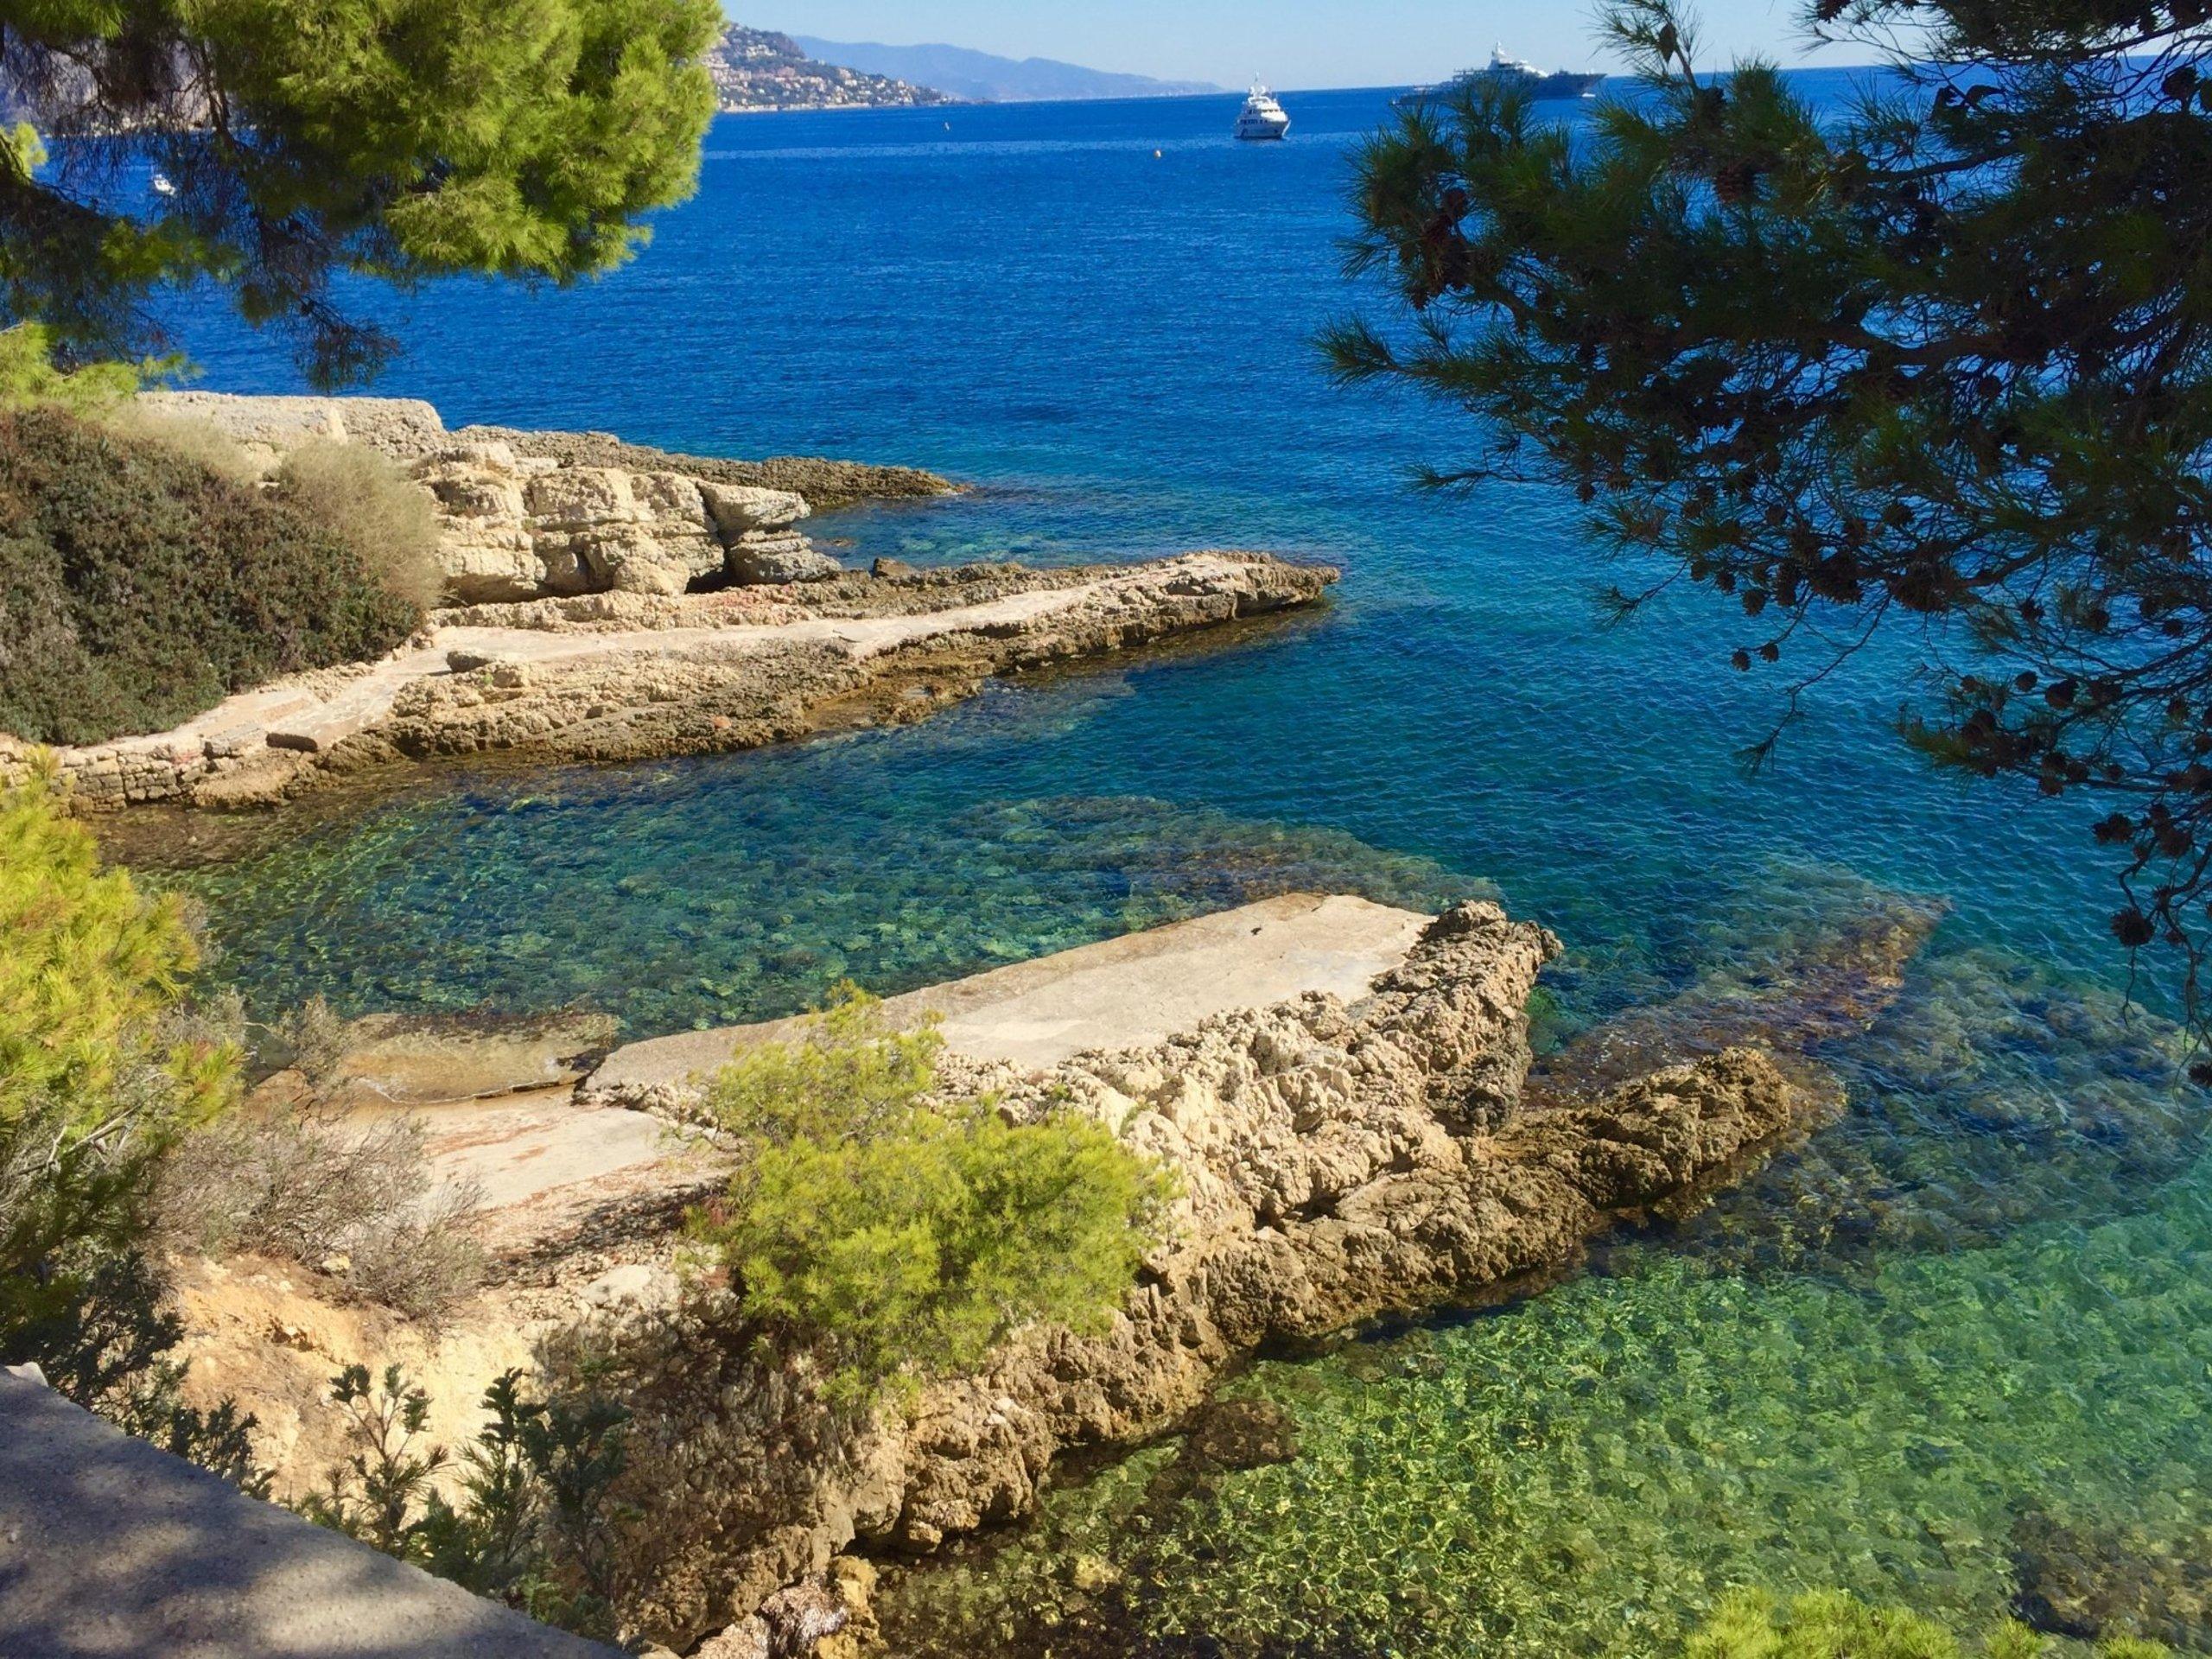 Jardin D Eze Nouveau Villa Gracia B&b Reviews Beaulieu Sur Mer France